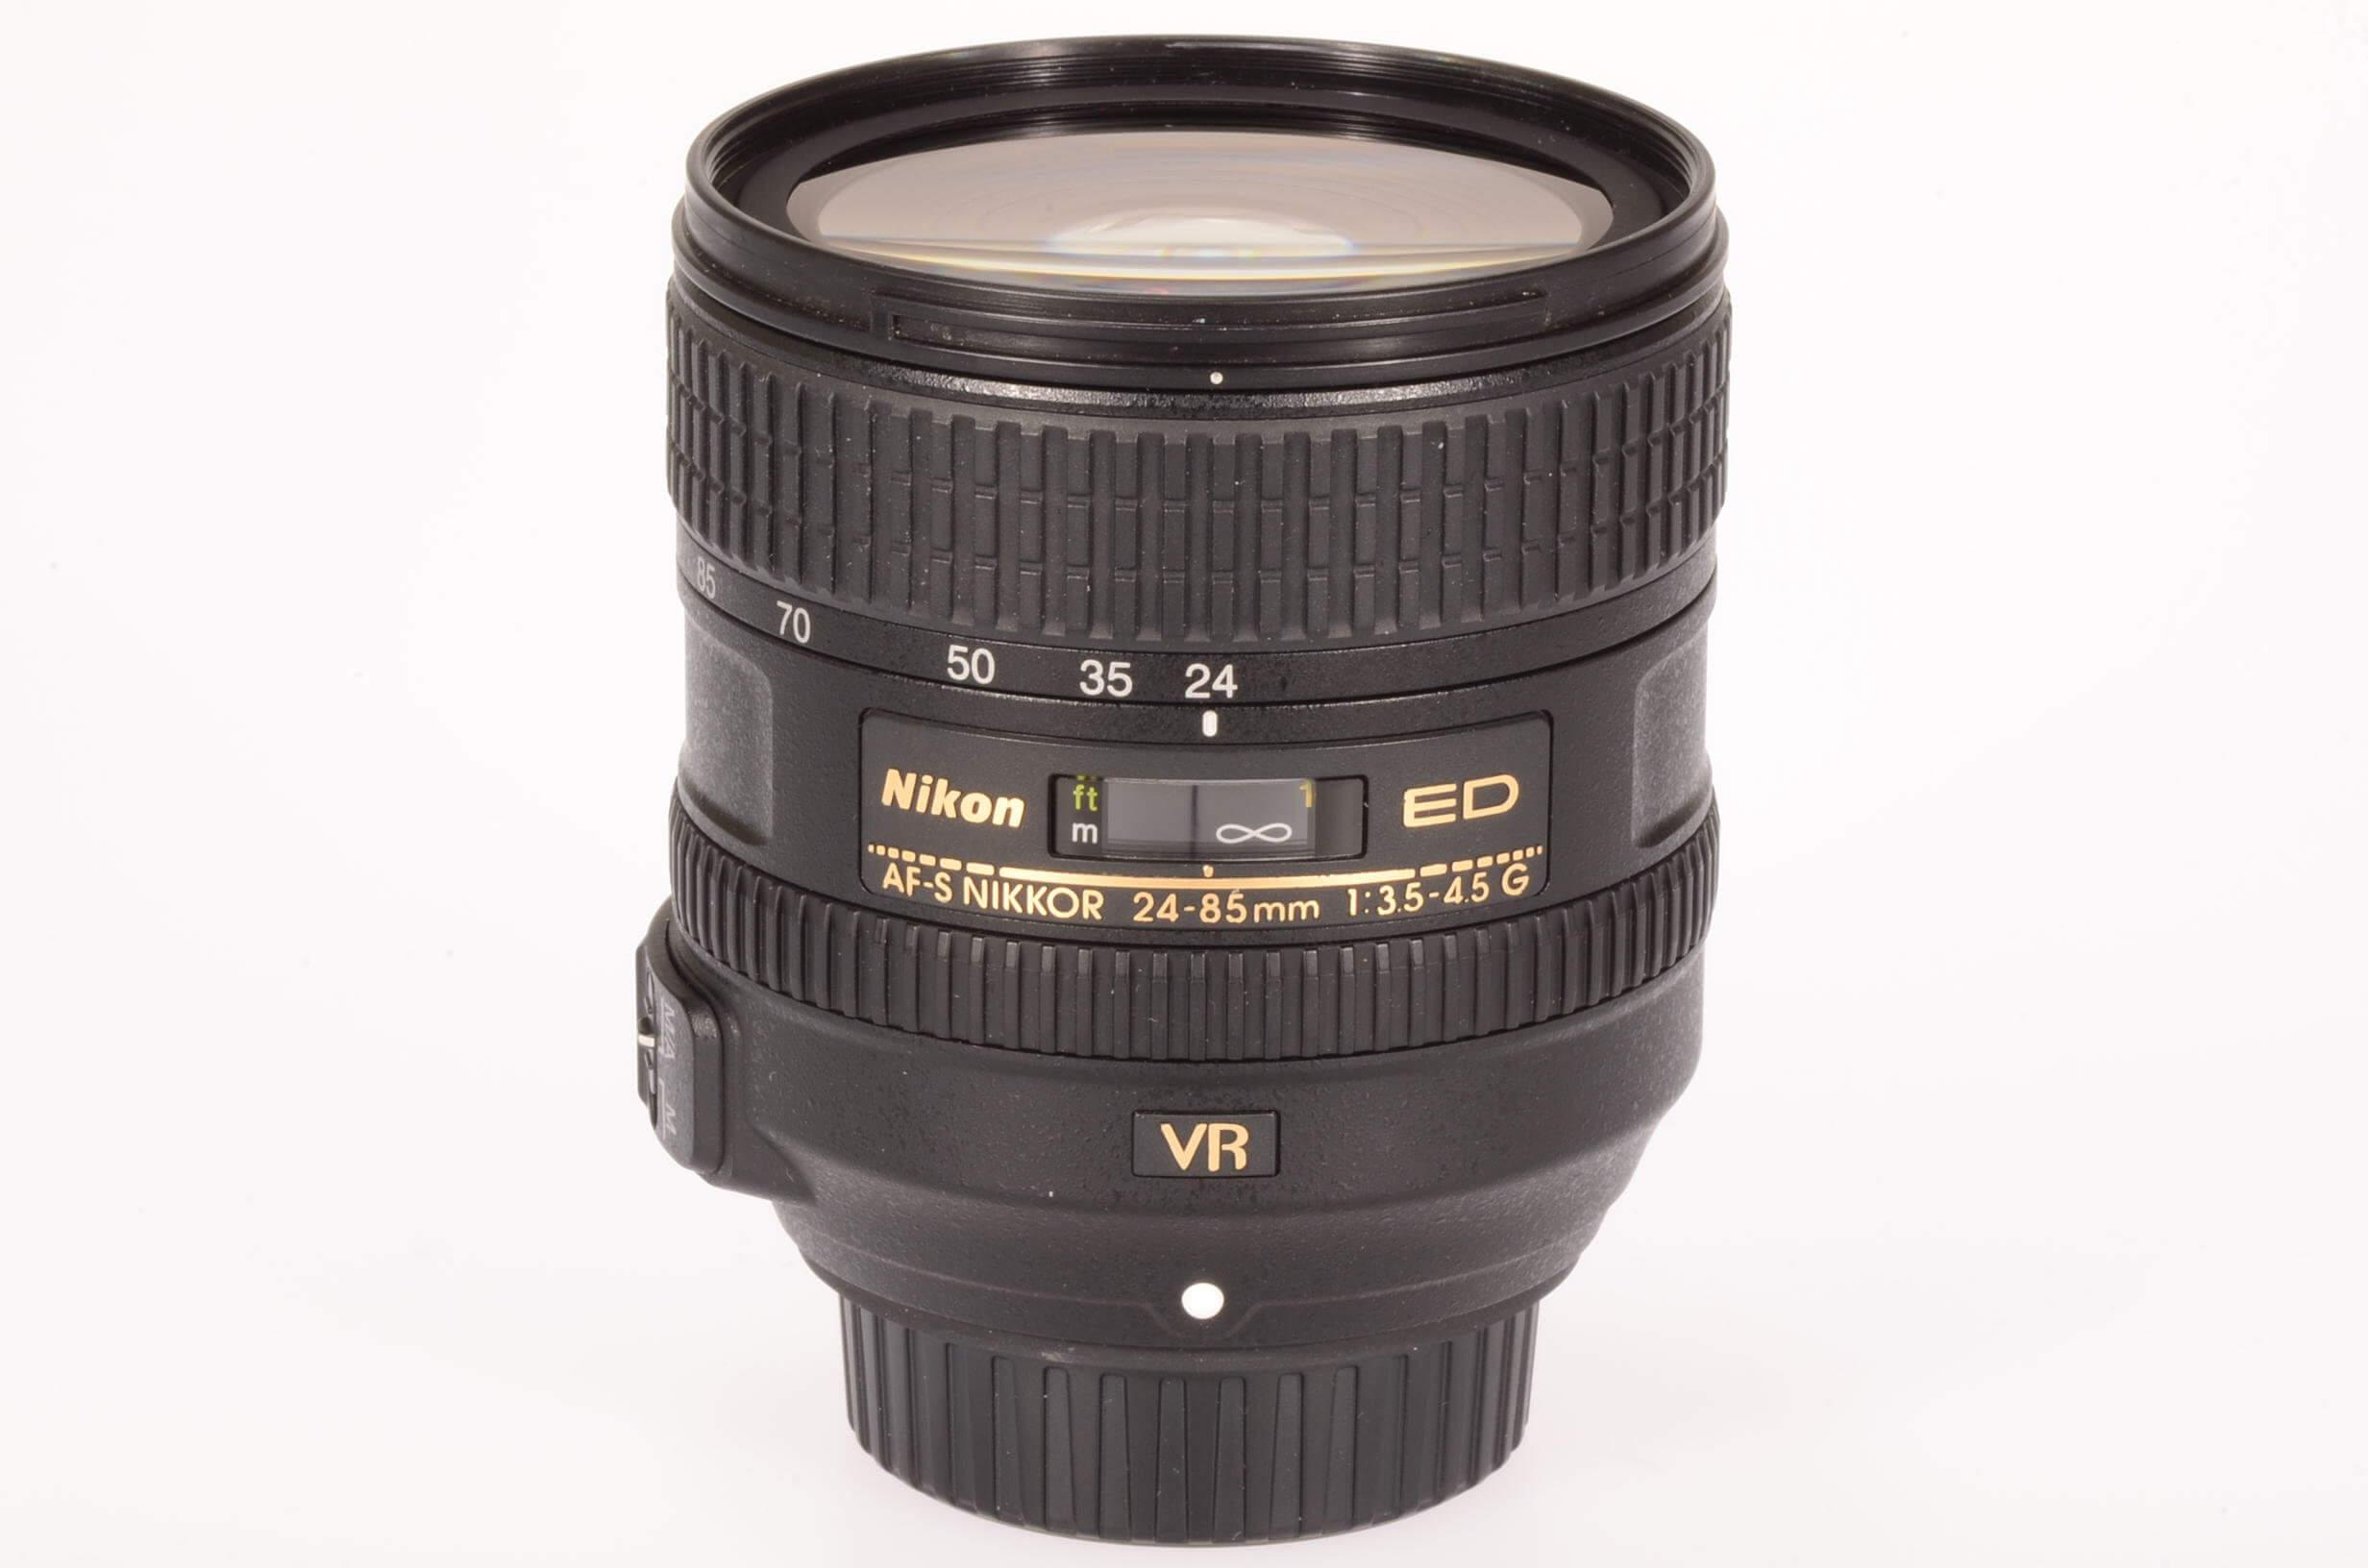 Nikon 24-85mm f3.5-4.5 AF-S VR, virtually mint!